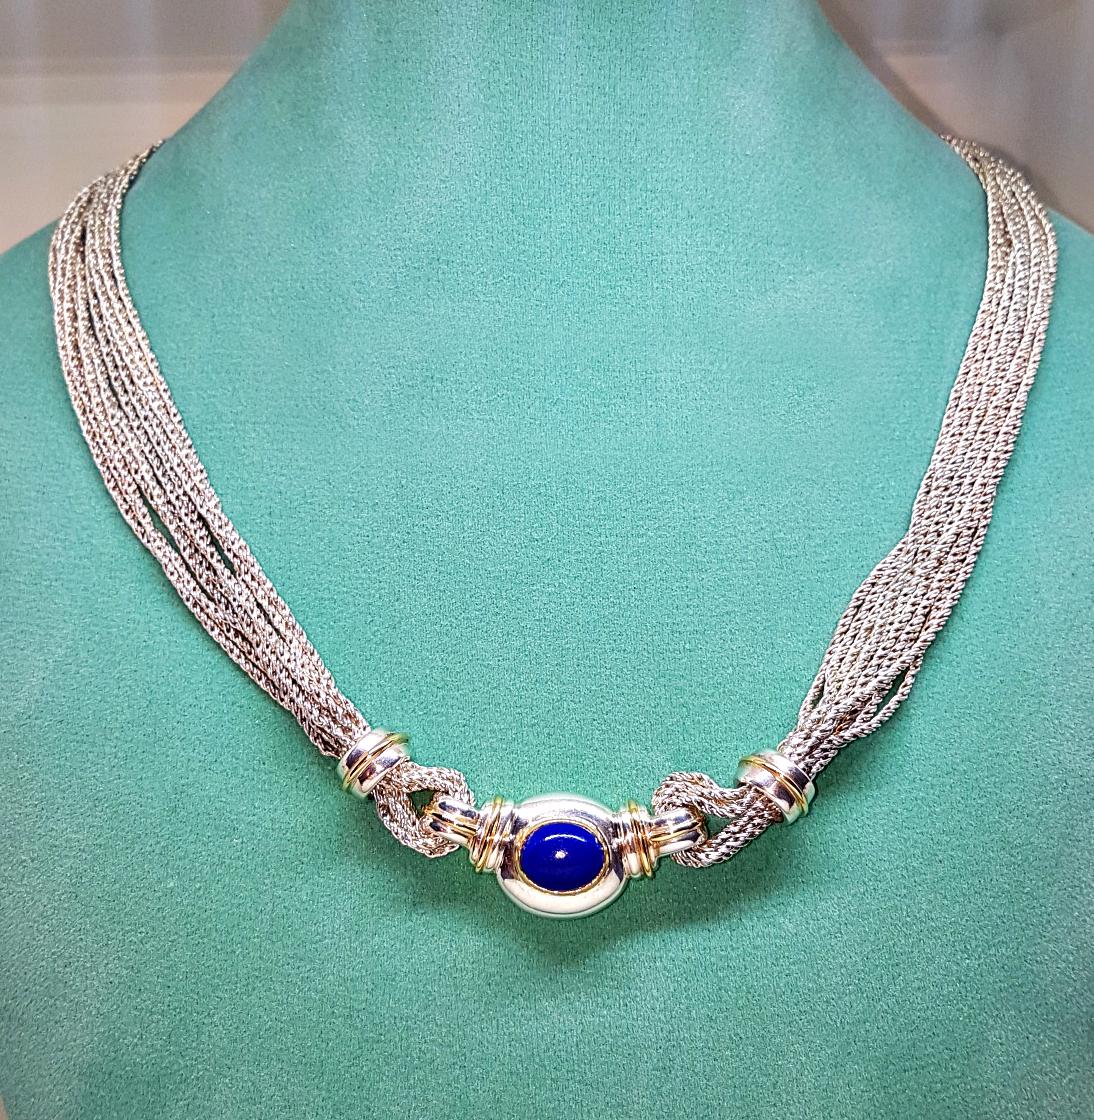 <b>Tiffany &amp; Co.</b>18karat Gold / Sterling Silver Blue Lapis Gemstone 17